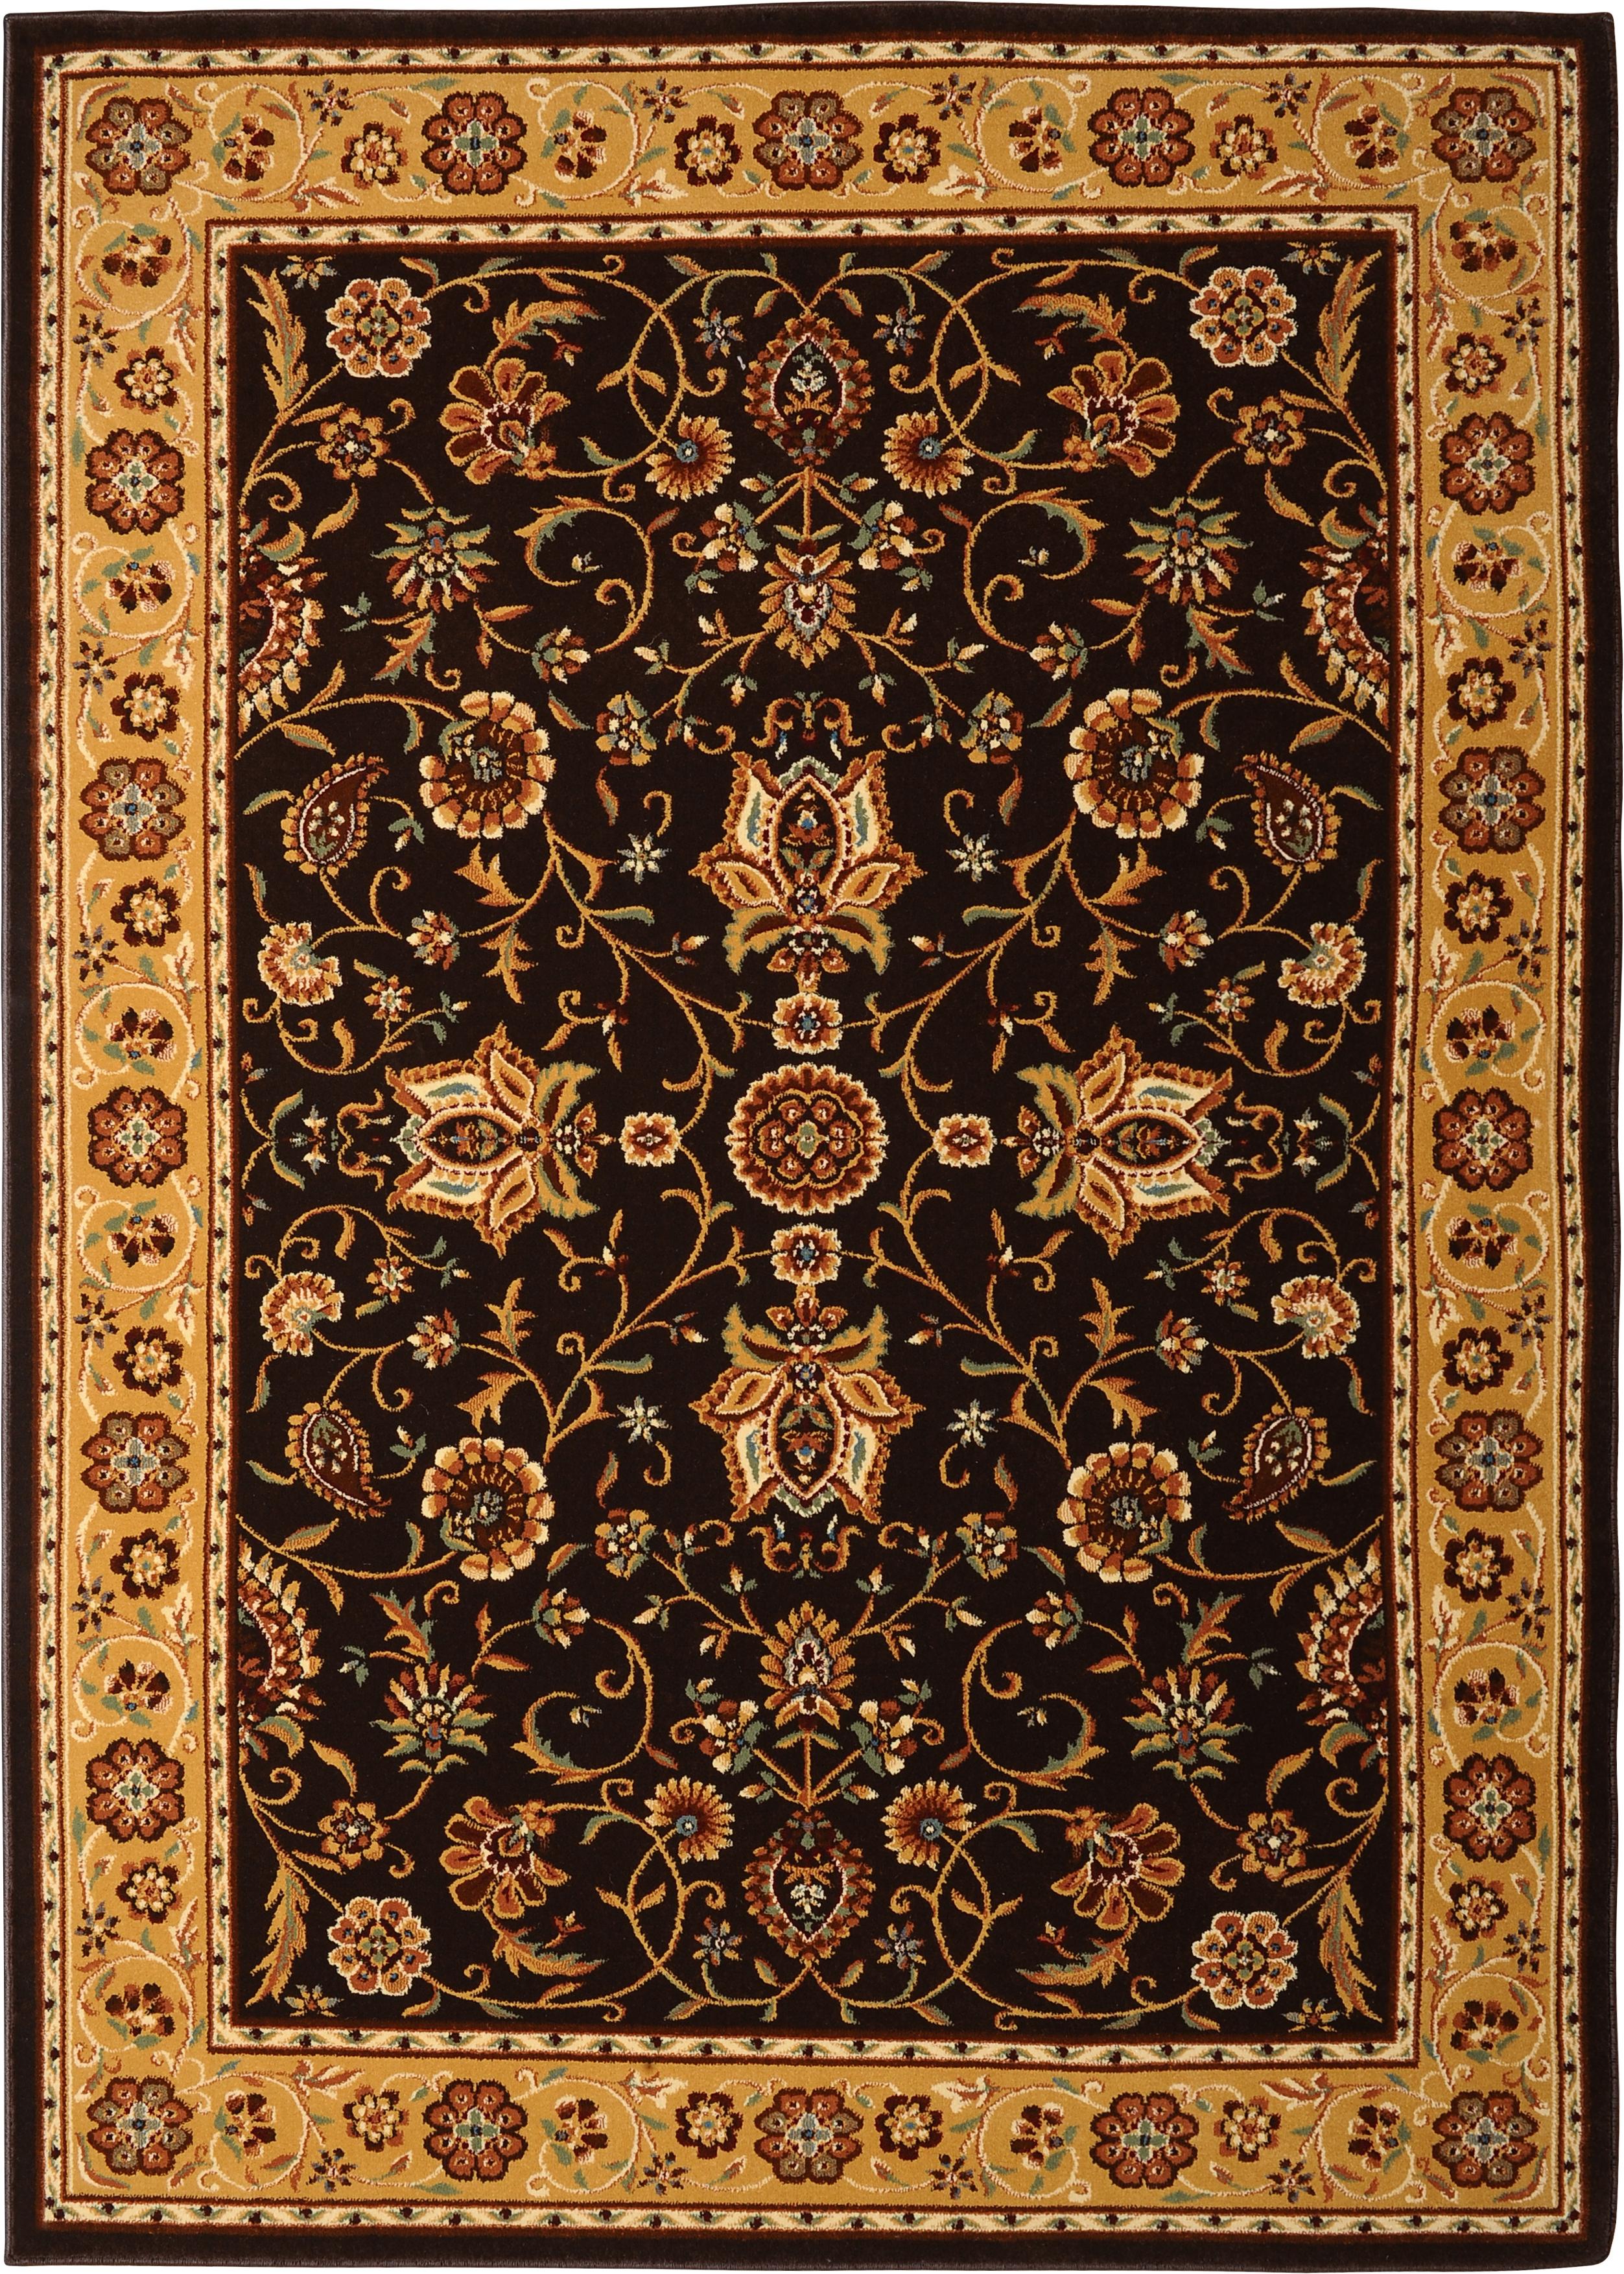 Brown Gold Persien Area Rug 6x8 Oriental Carpet 3207